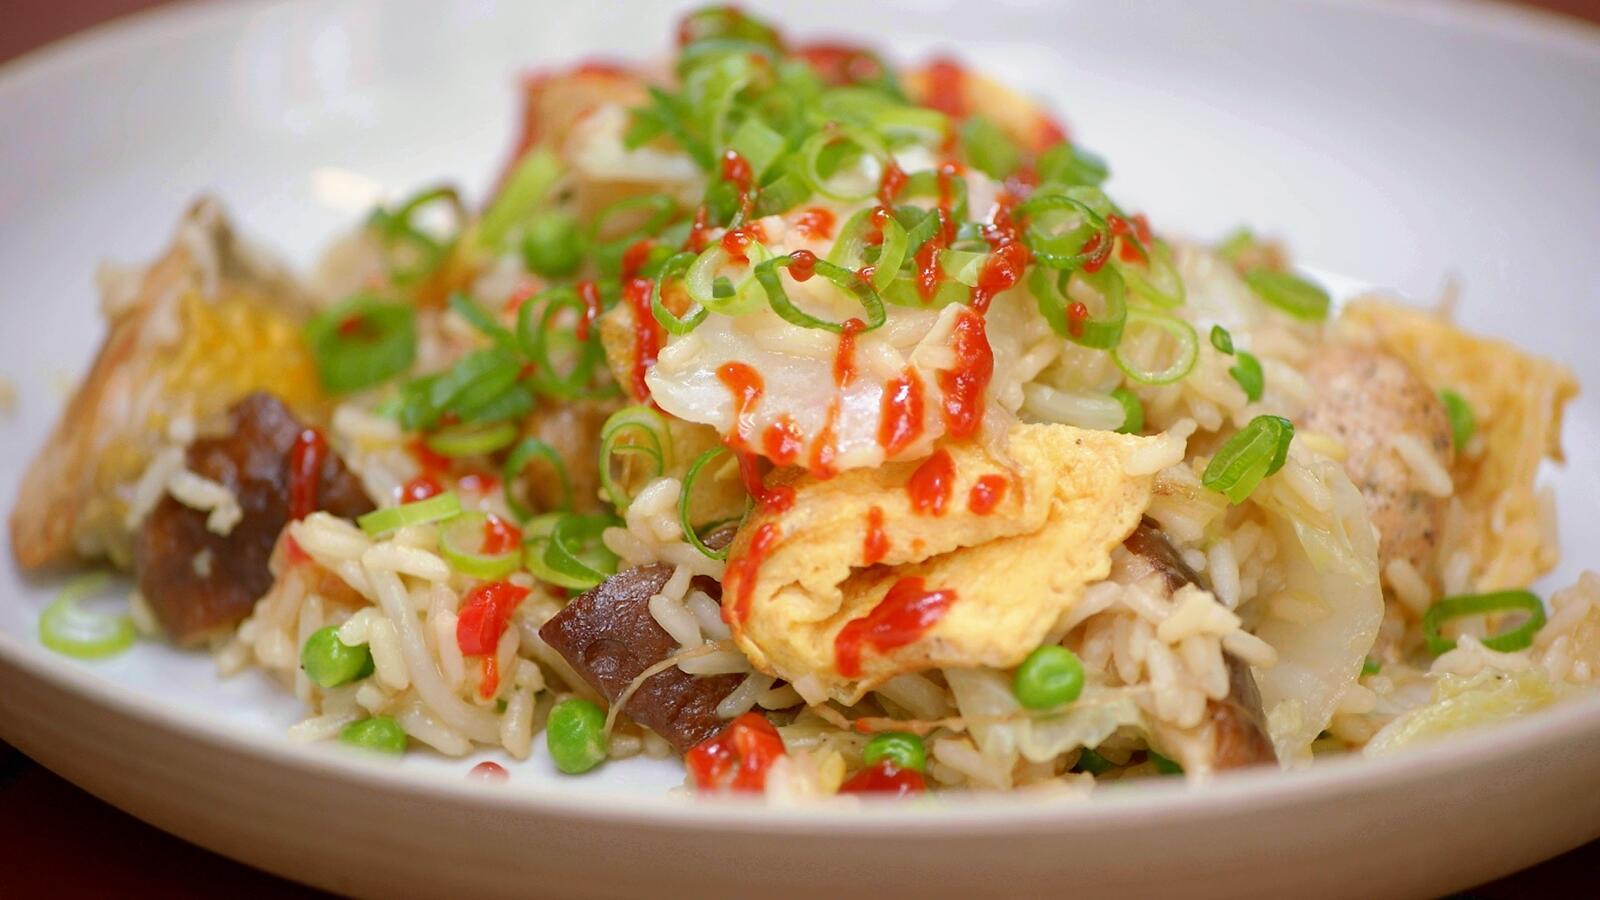 Gebakken rijst met Chinese kool, parelhoen en omelet